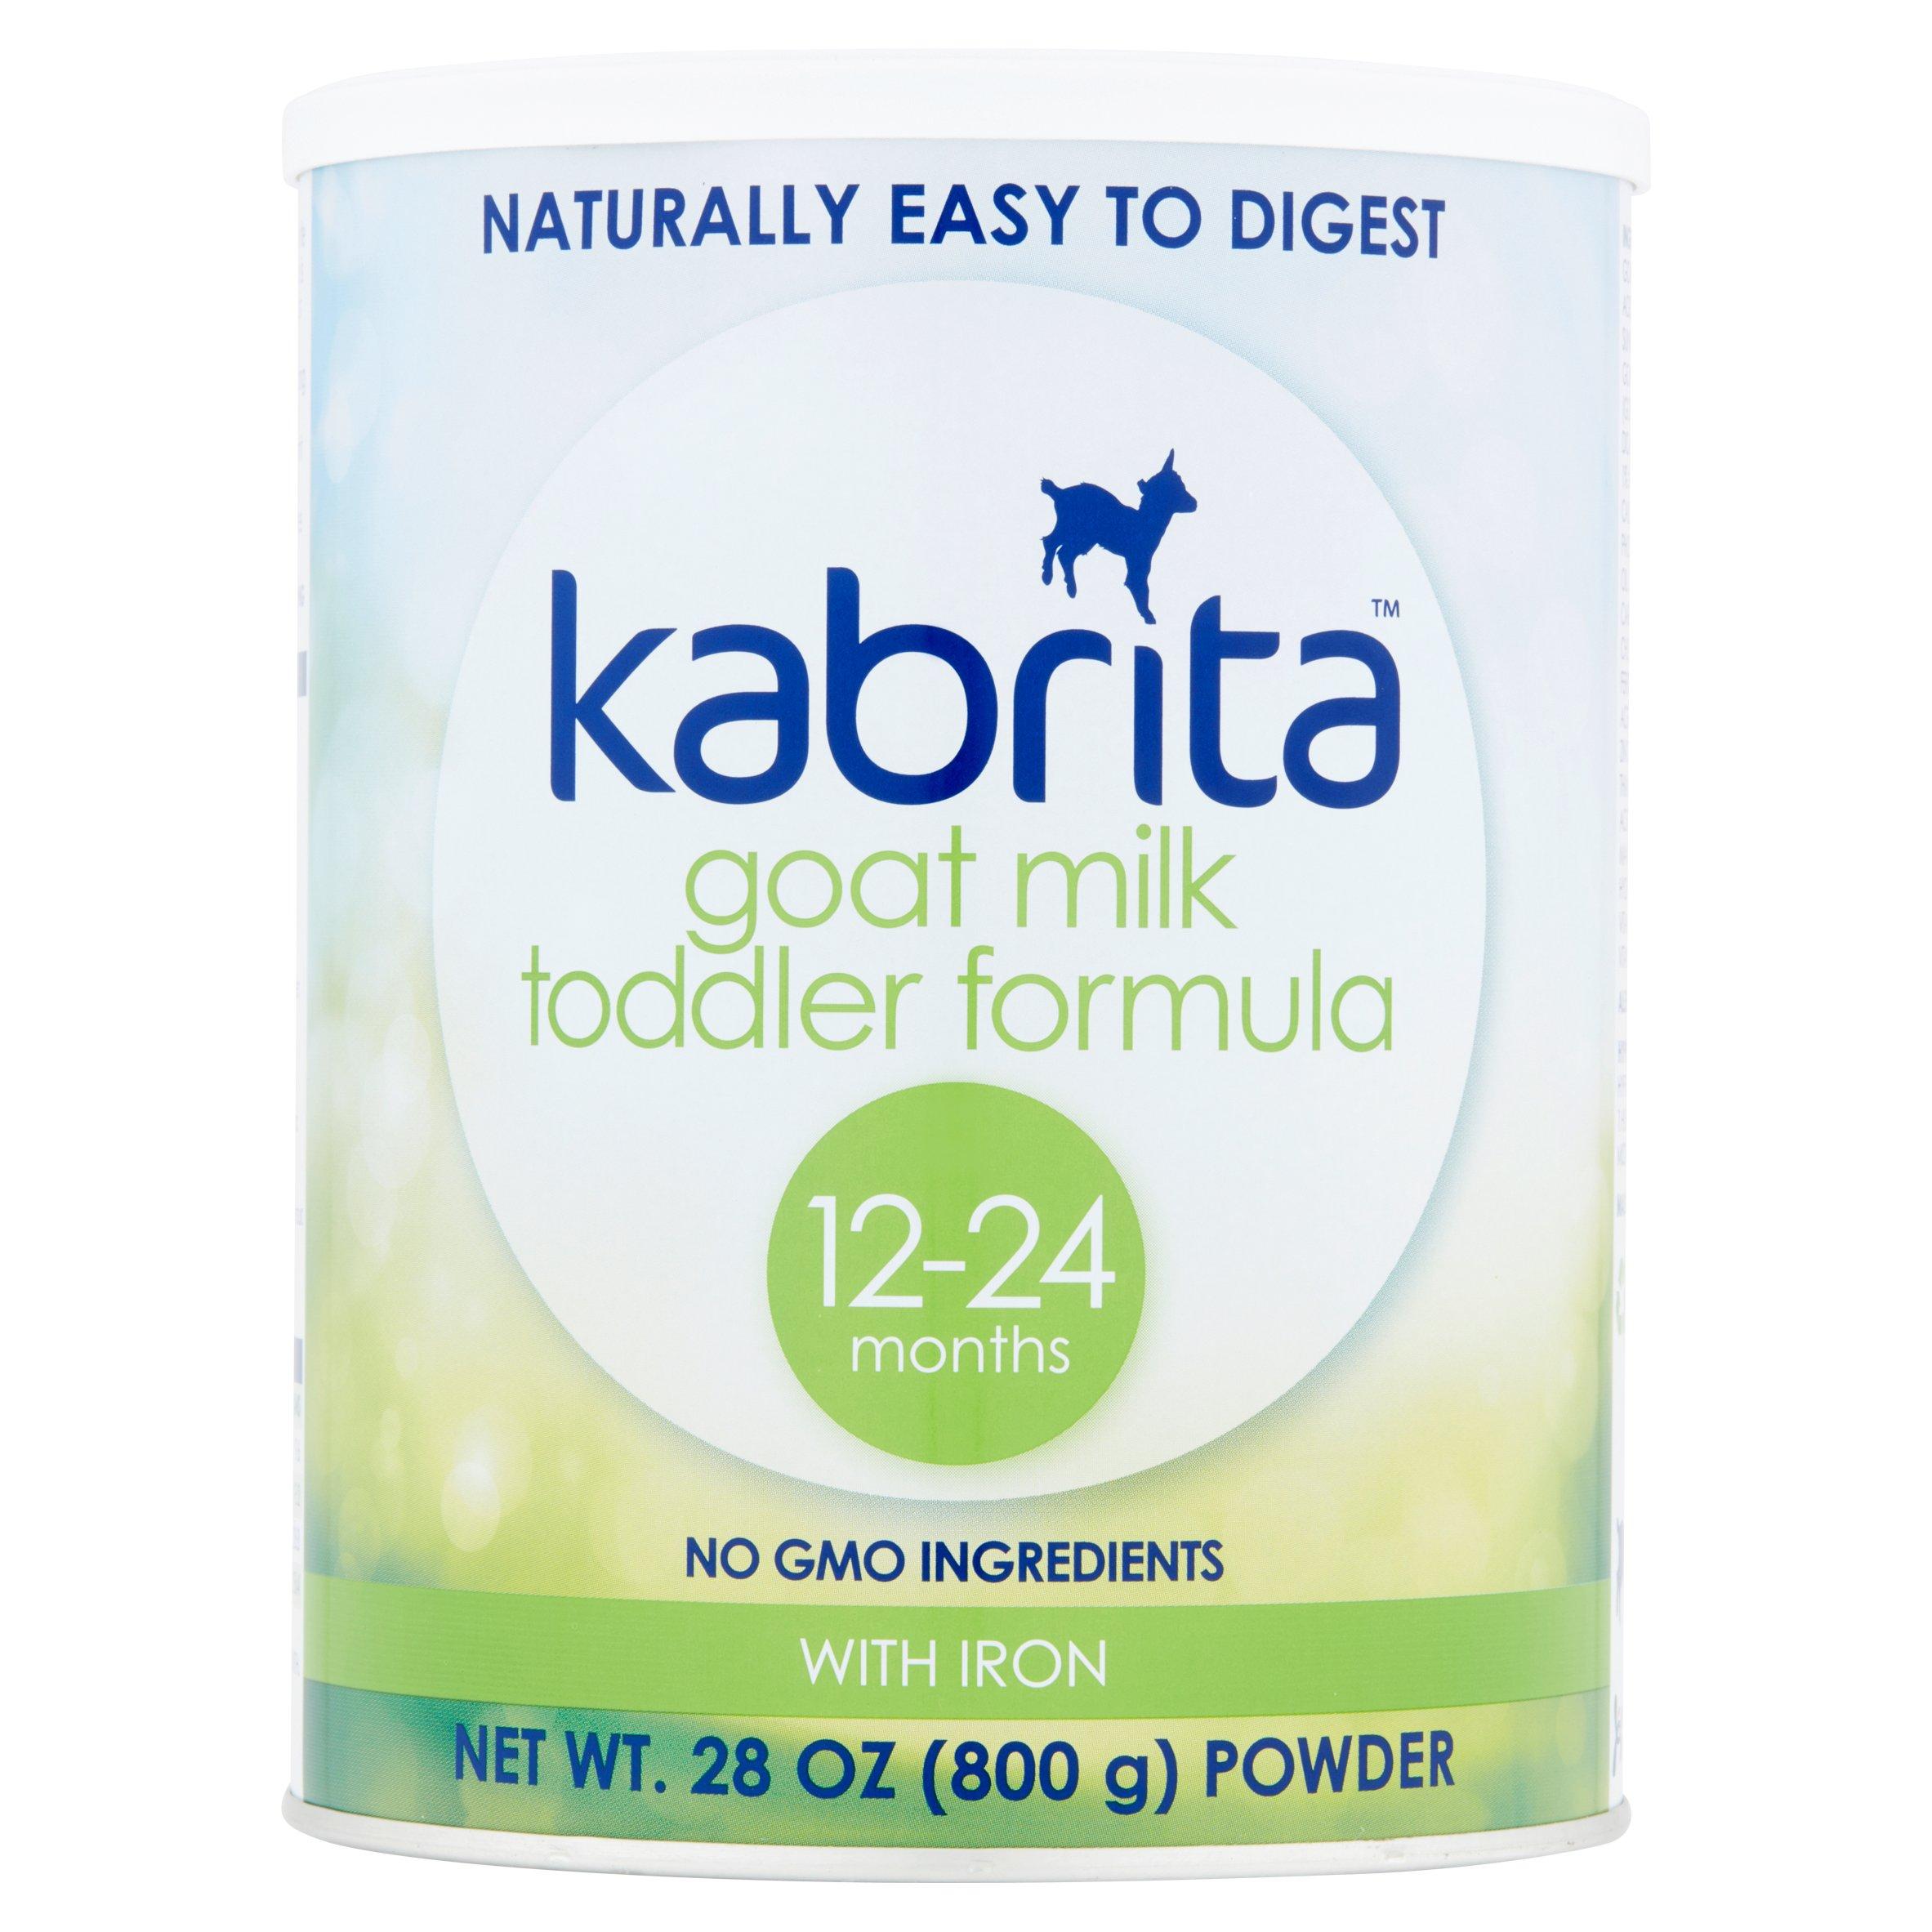 Kabrita Goat Milk Formula, Powder, Non-GMO, Natural and Gentle, 28 oz (Pack of 6) by Kabrita